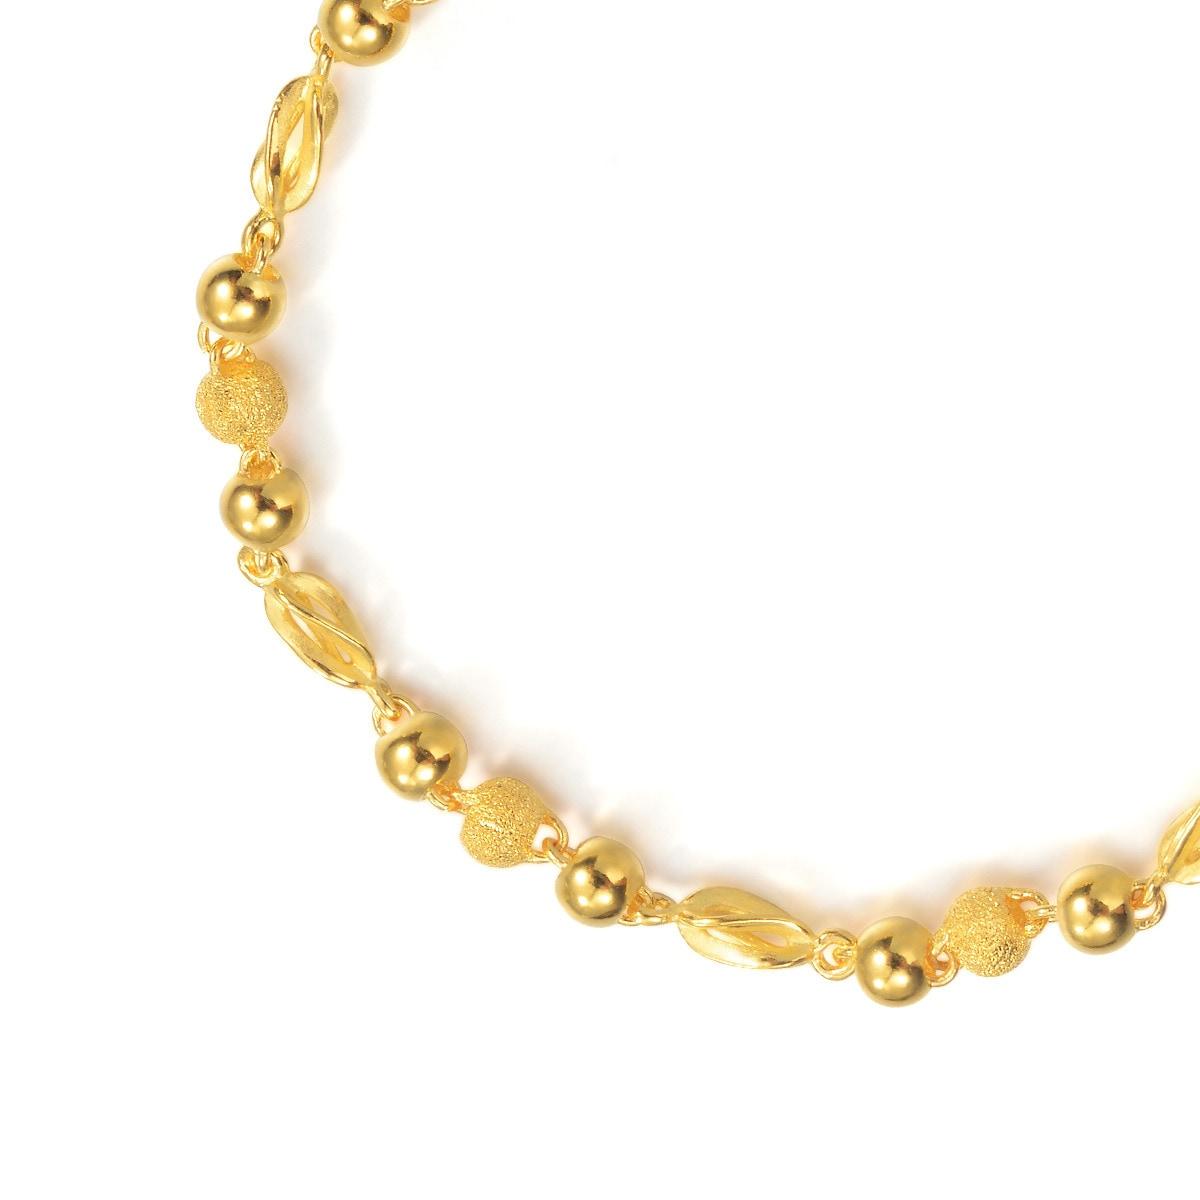 9999 Gold Bracelet Chow Sang Sang Jewellery eShop